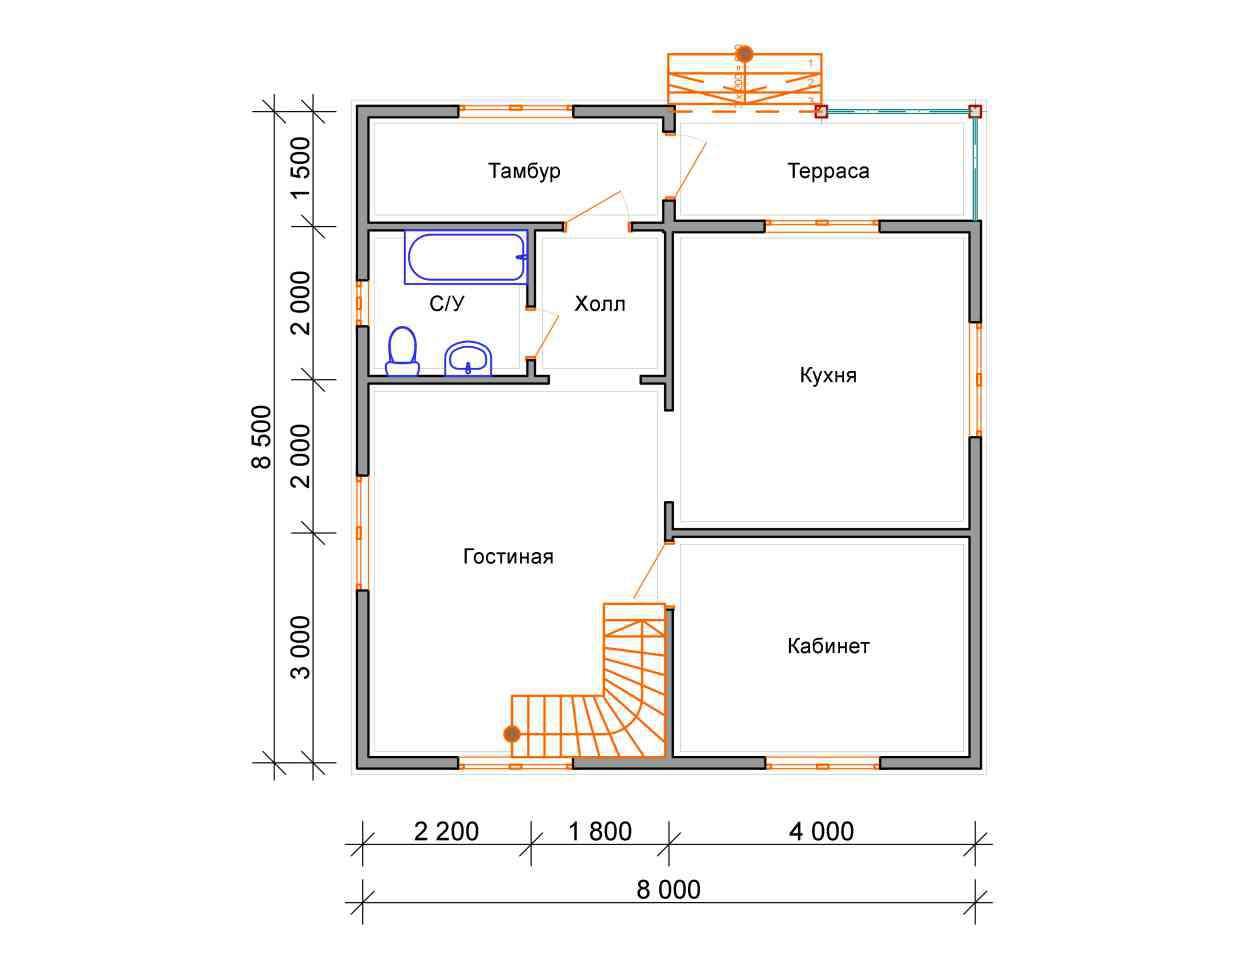 дом из бруса 8,5 на 8 план 1 этажа есипово